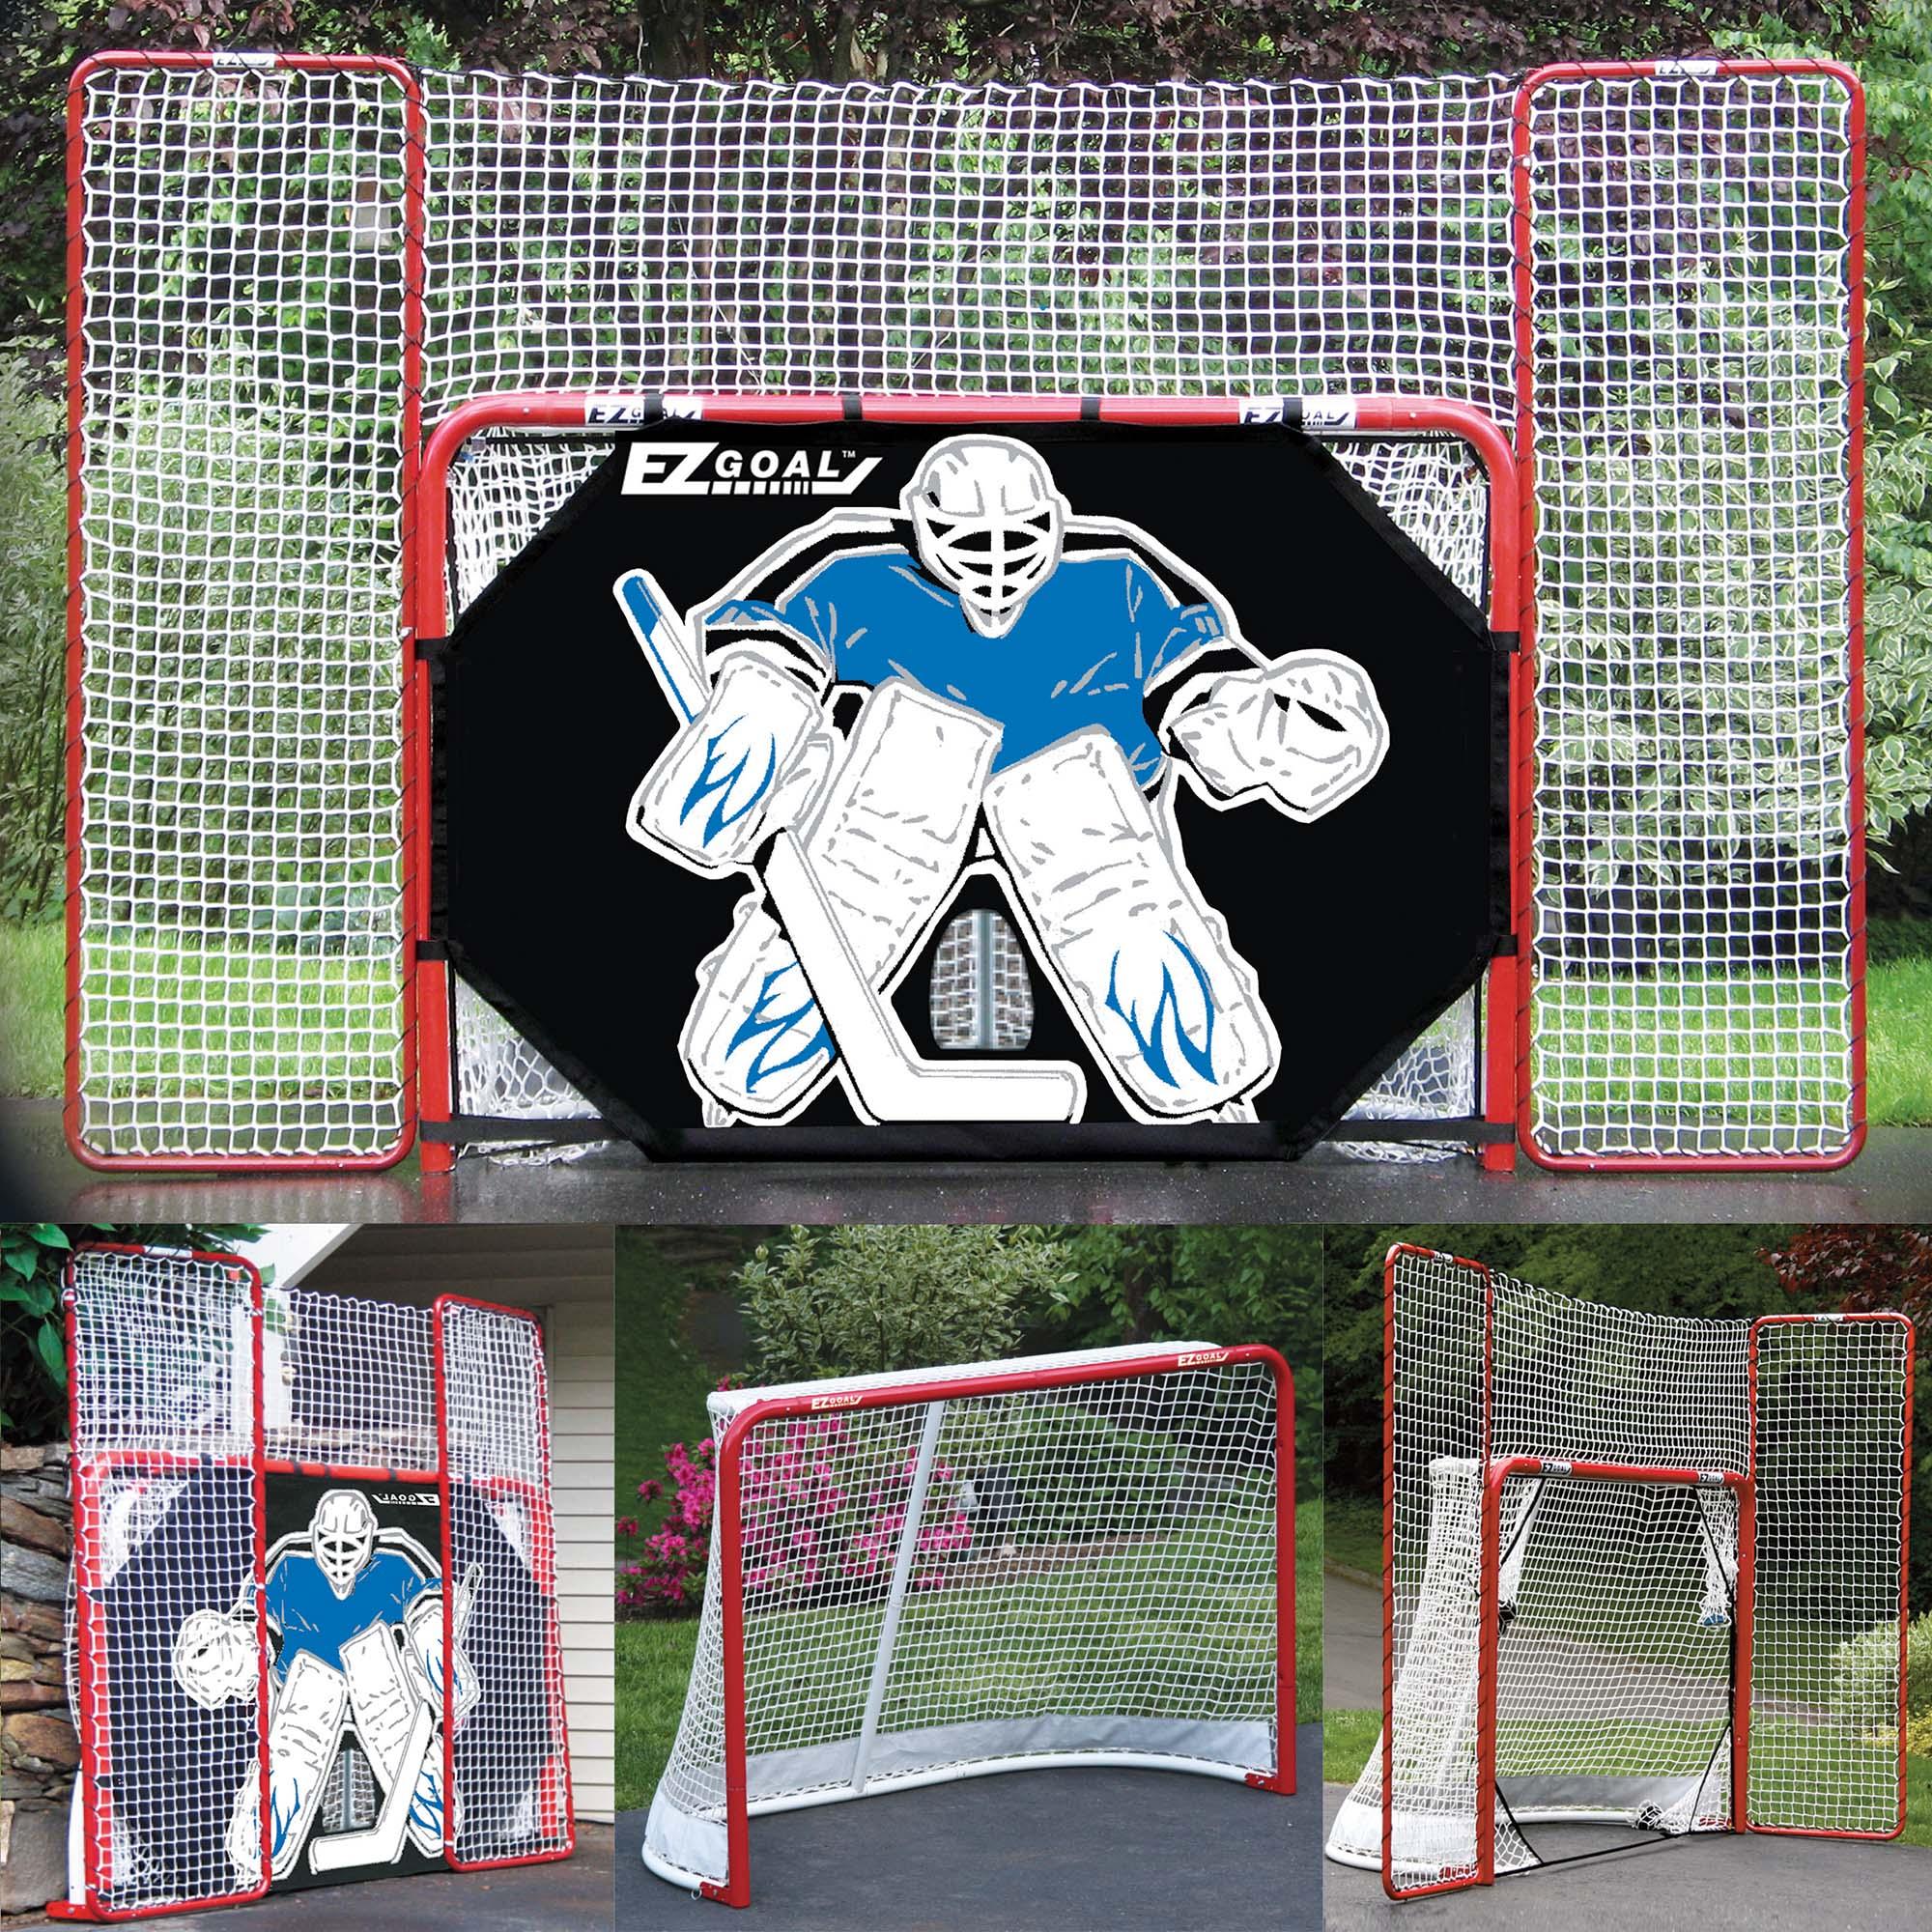 "EZgoal Monster 6' x 4'2"" Official Regulation Folding Metal Hockey Goal Net, 10' x 6' Backstop Shooter Tutor, 5 Net Pocket Targets"